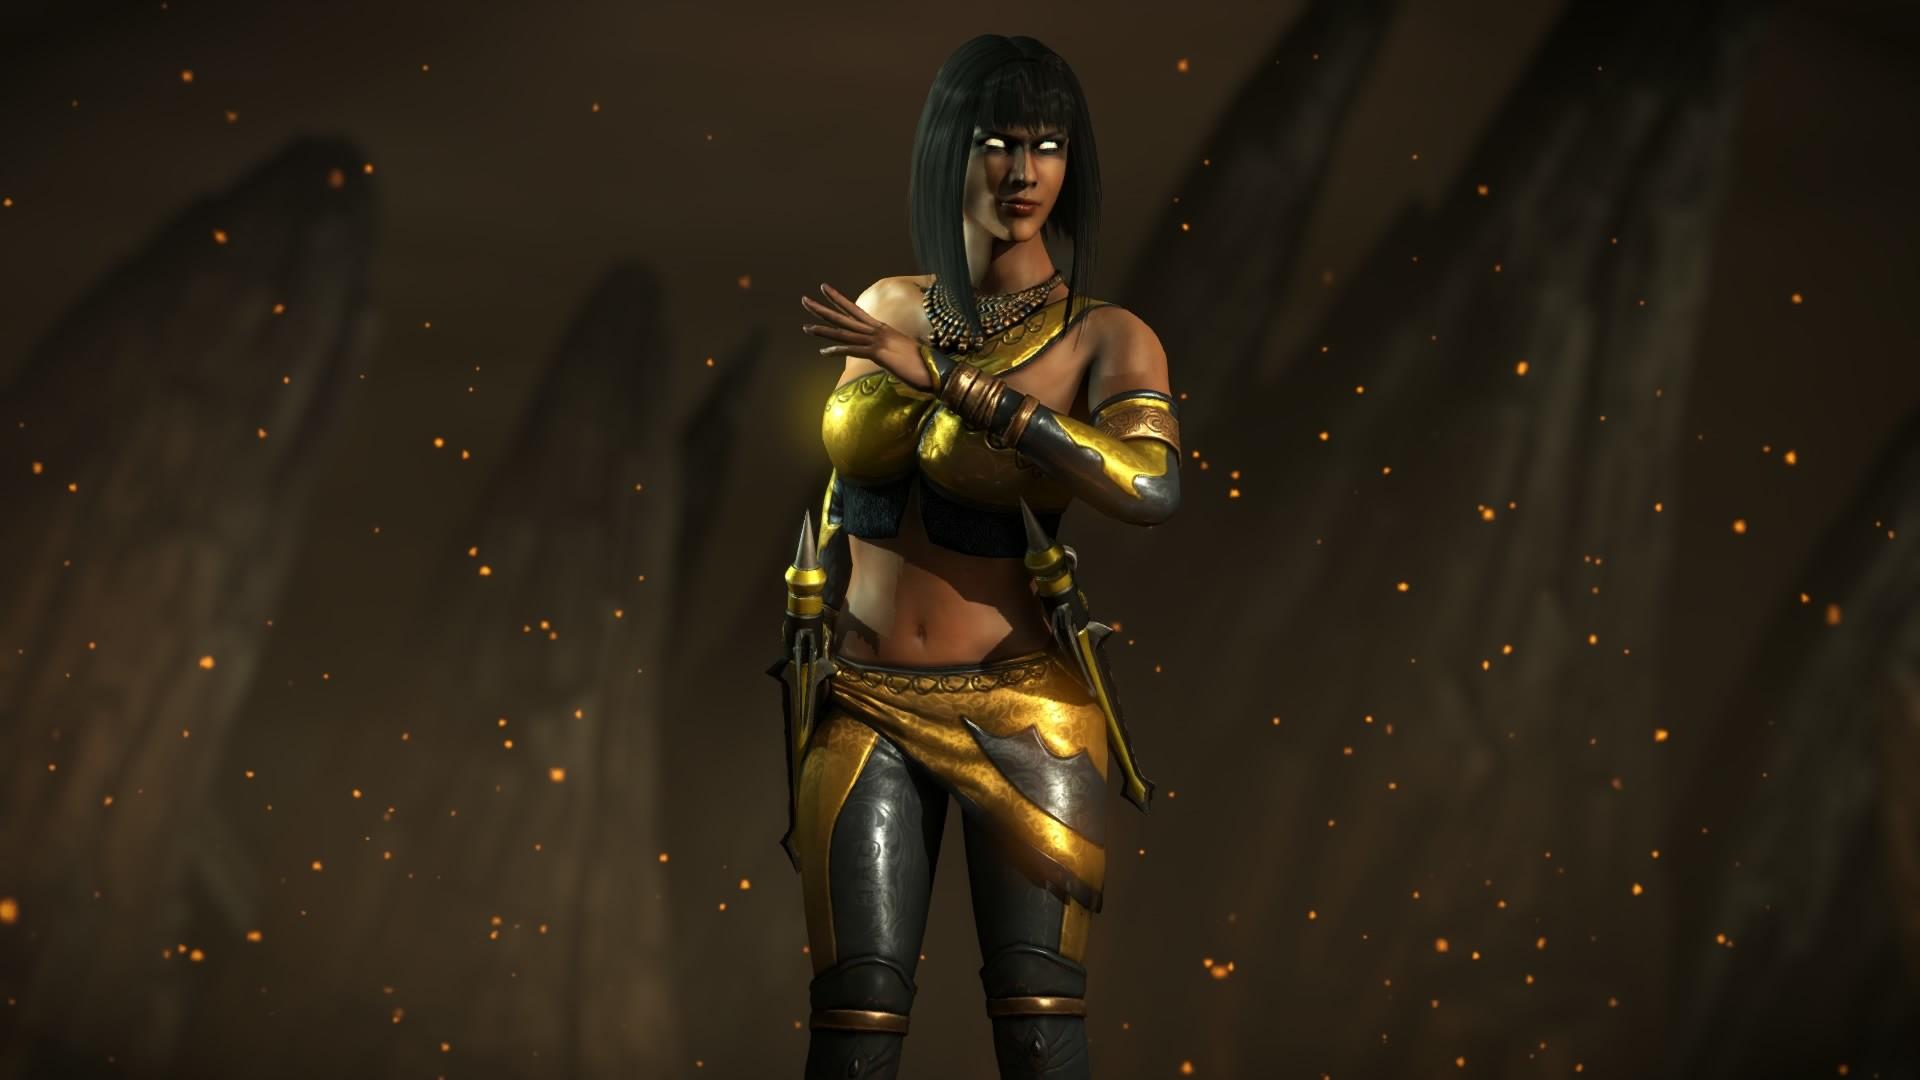 … Mortal Kombat X:Tanya by Kabukiart157